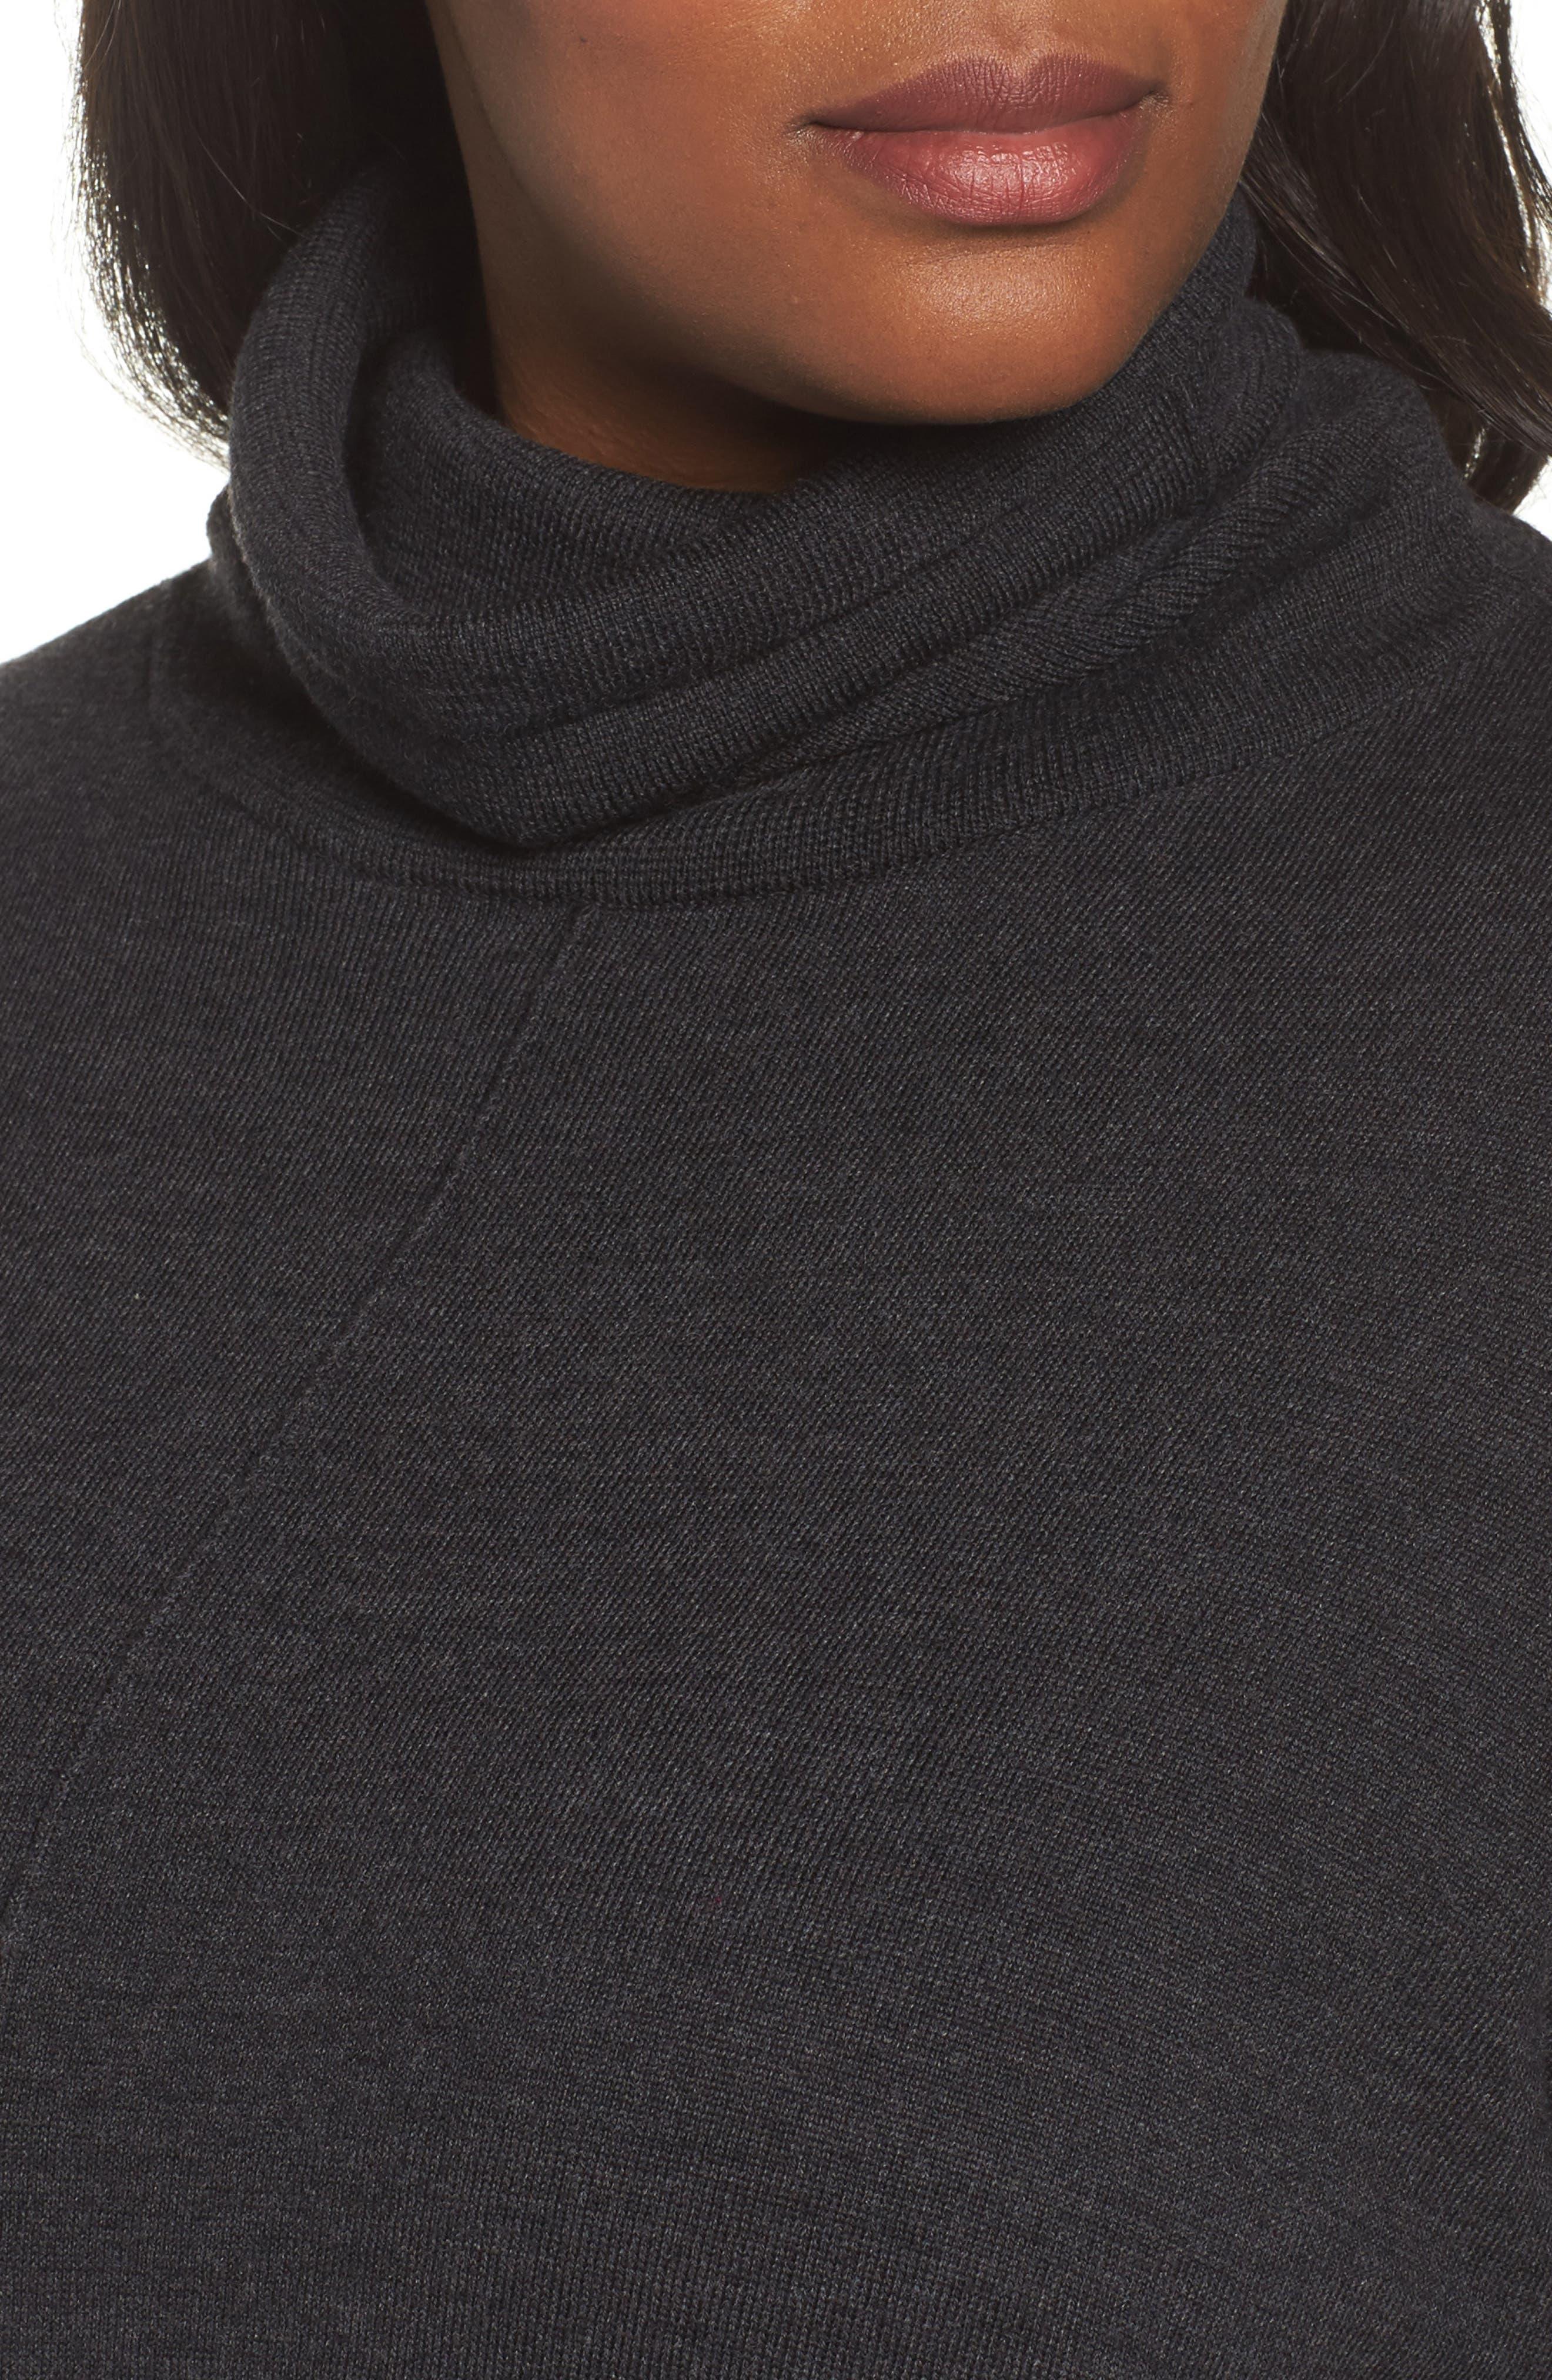 Merino Wool Turtleneck Sweater,                             Alternate thumbnail 4, color,                             021